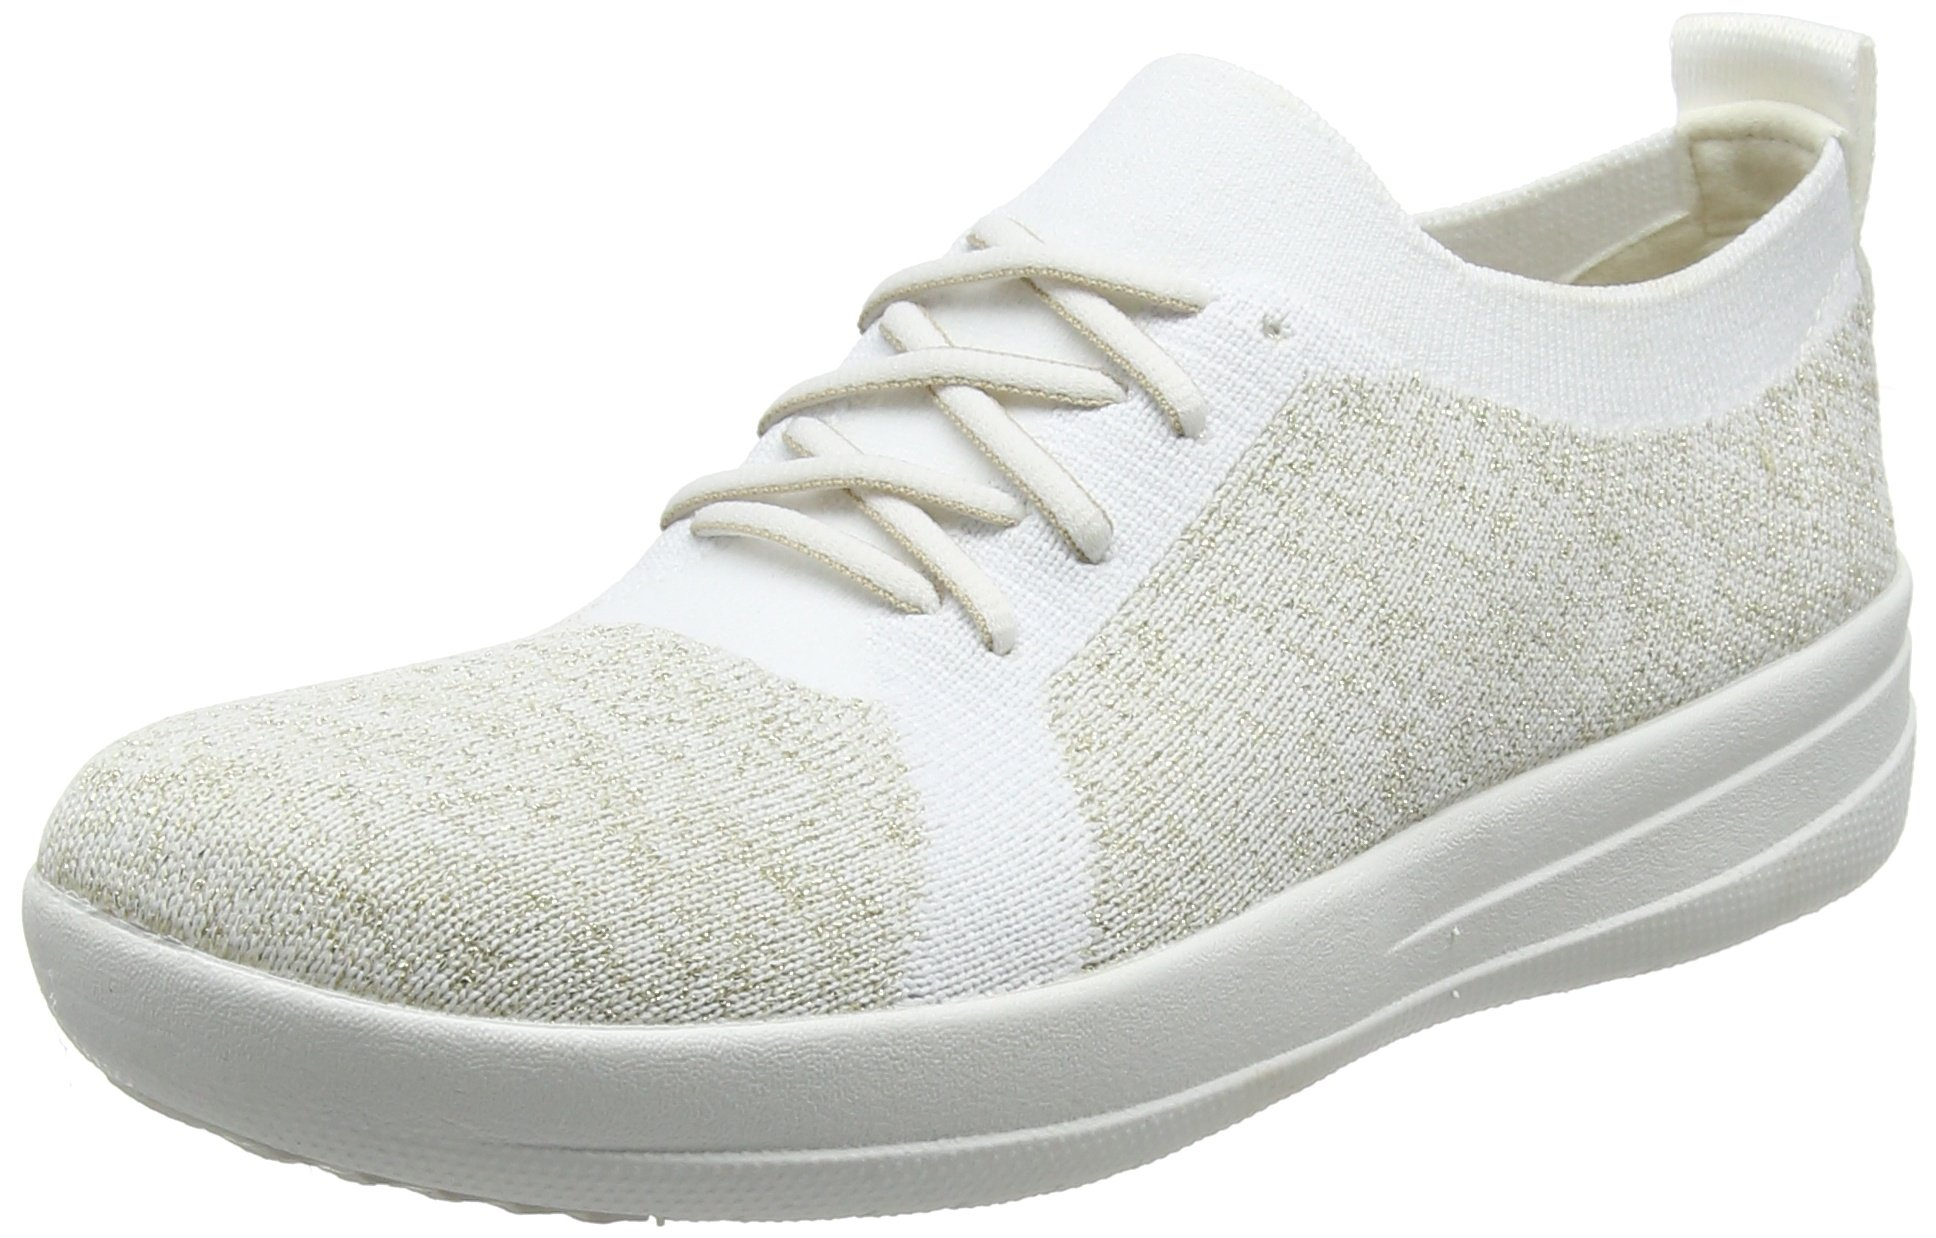 Gold F sporty Fitflop Multicolourmetallic Uberknit White urban Eu3 SneakersMetallicBasses 56636 Femme Uk XuPkZiOT